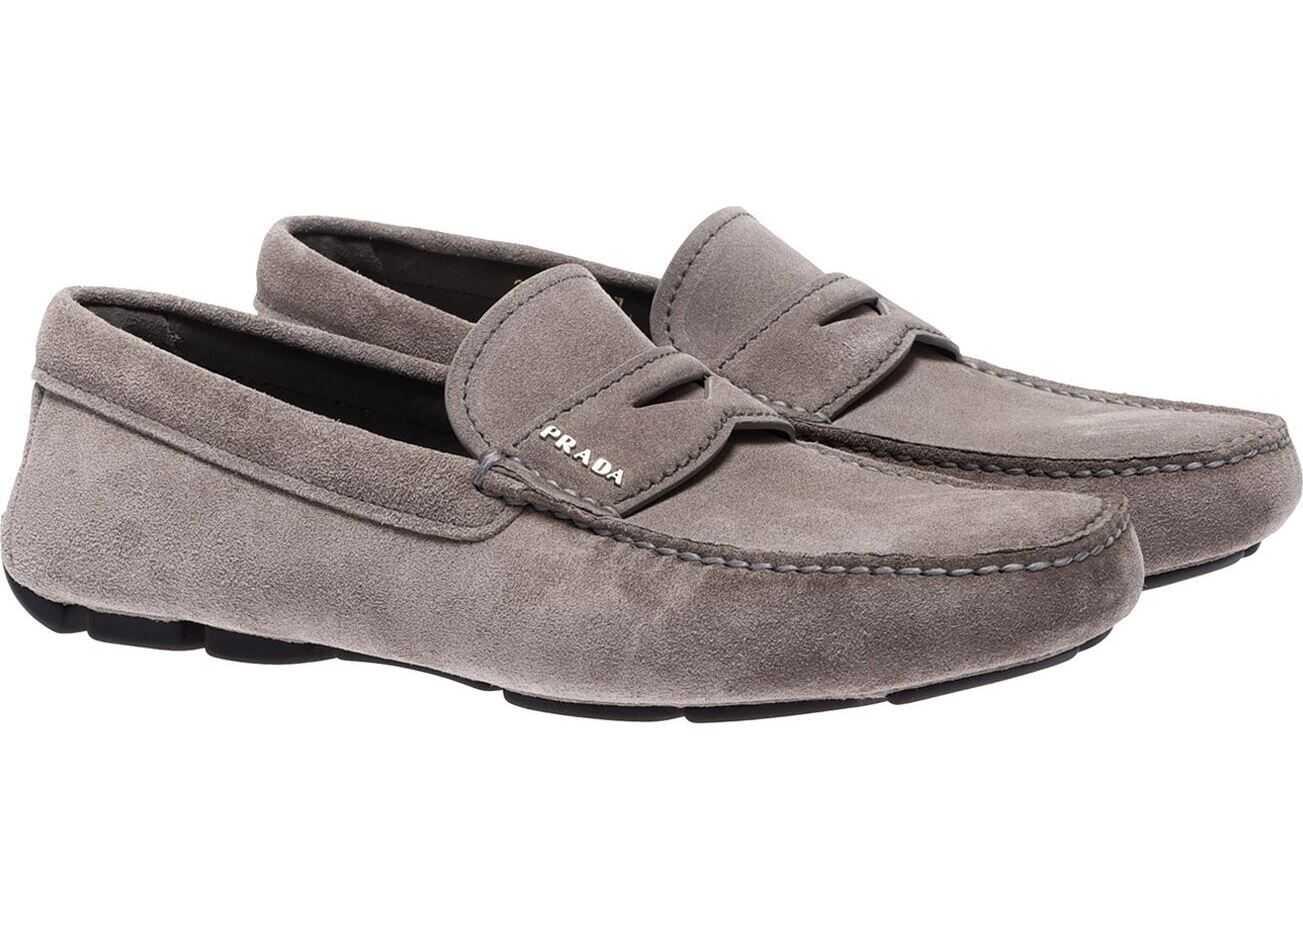 Prada Gray Suede Loafers By Prada Gray